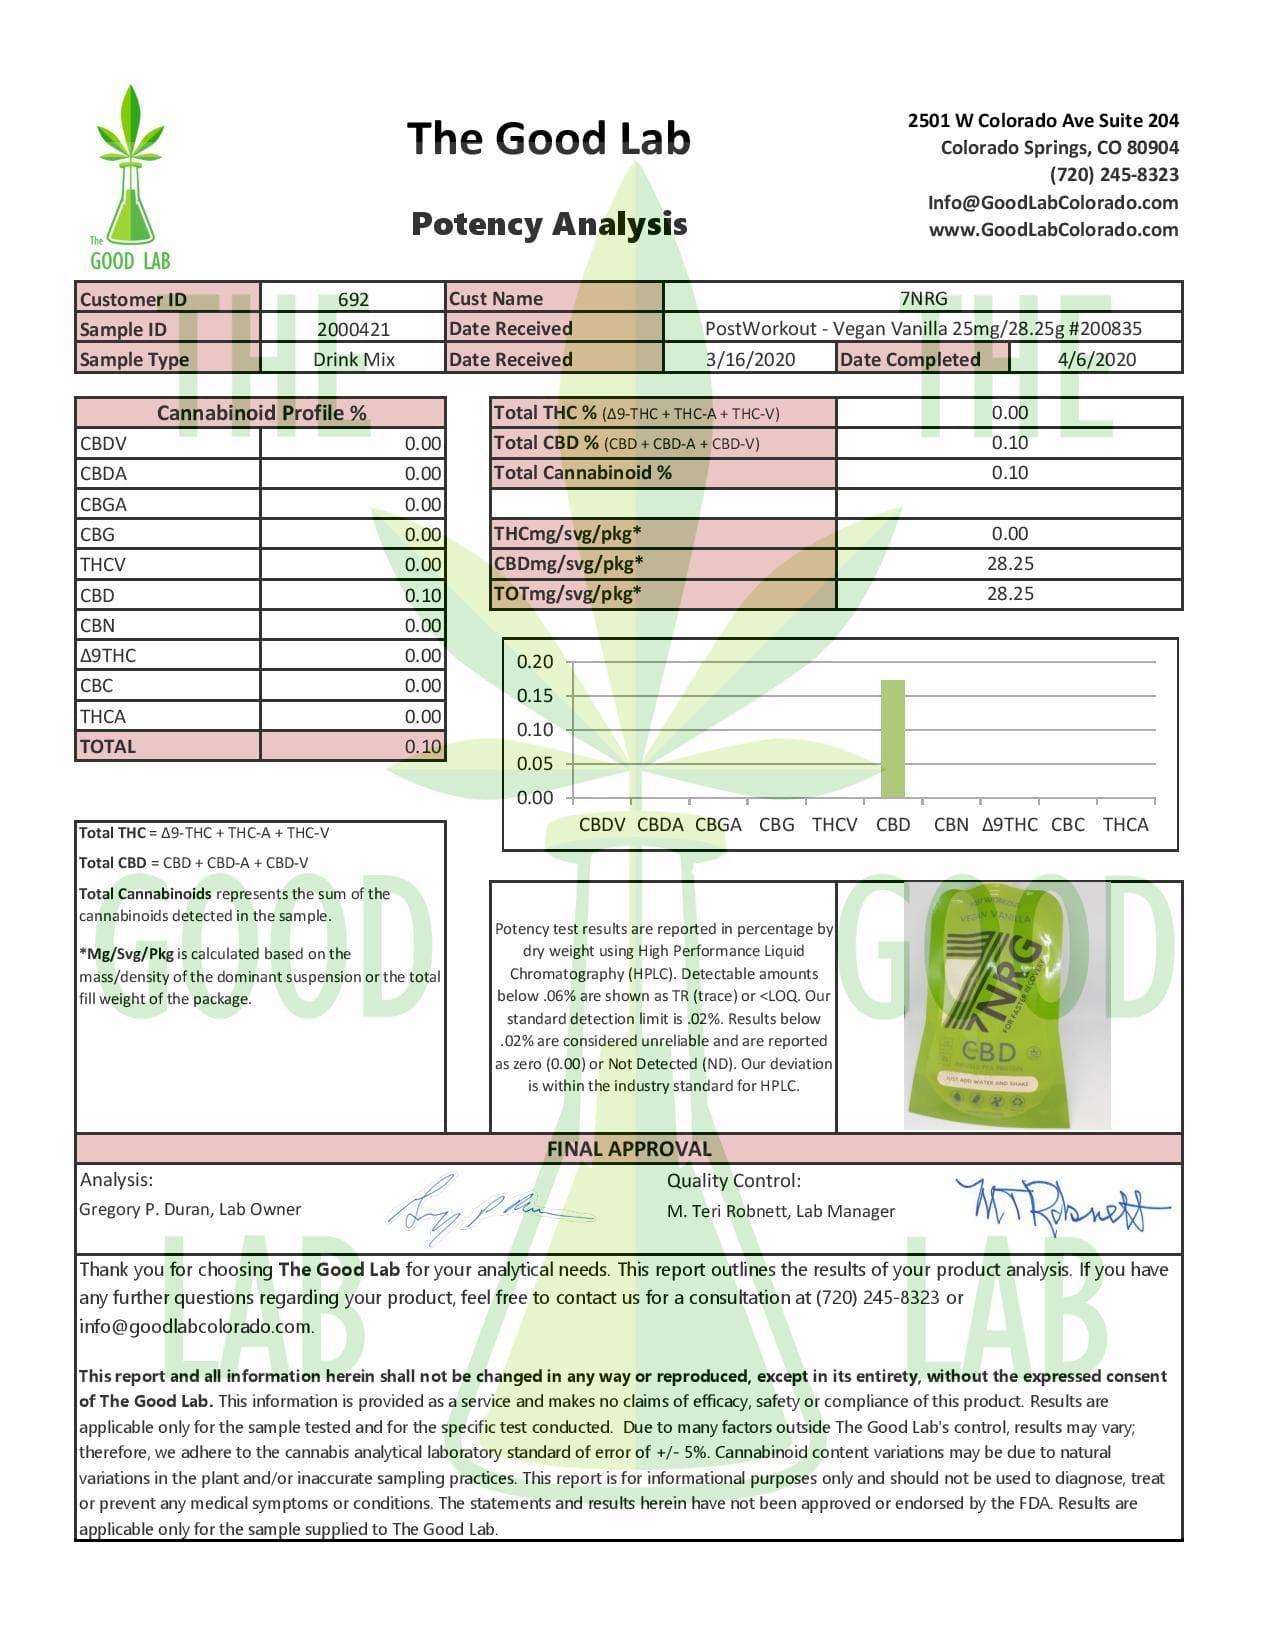 JWNBG0238X0073 1 525x679 - 12 x 7NRG Post-Workout Vegan Vanilla 25mg CBD Protein Shake